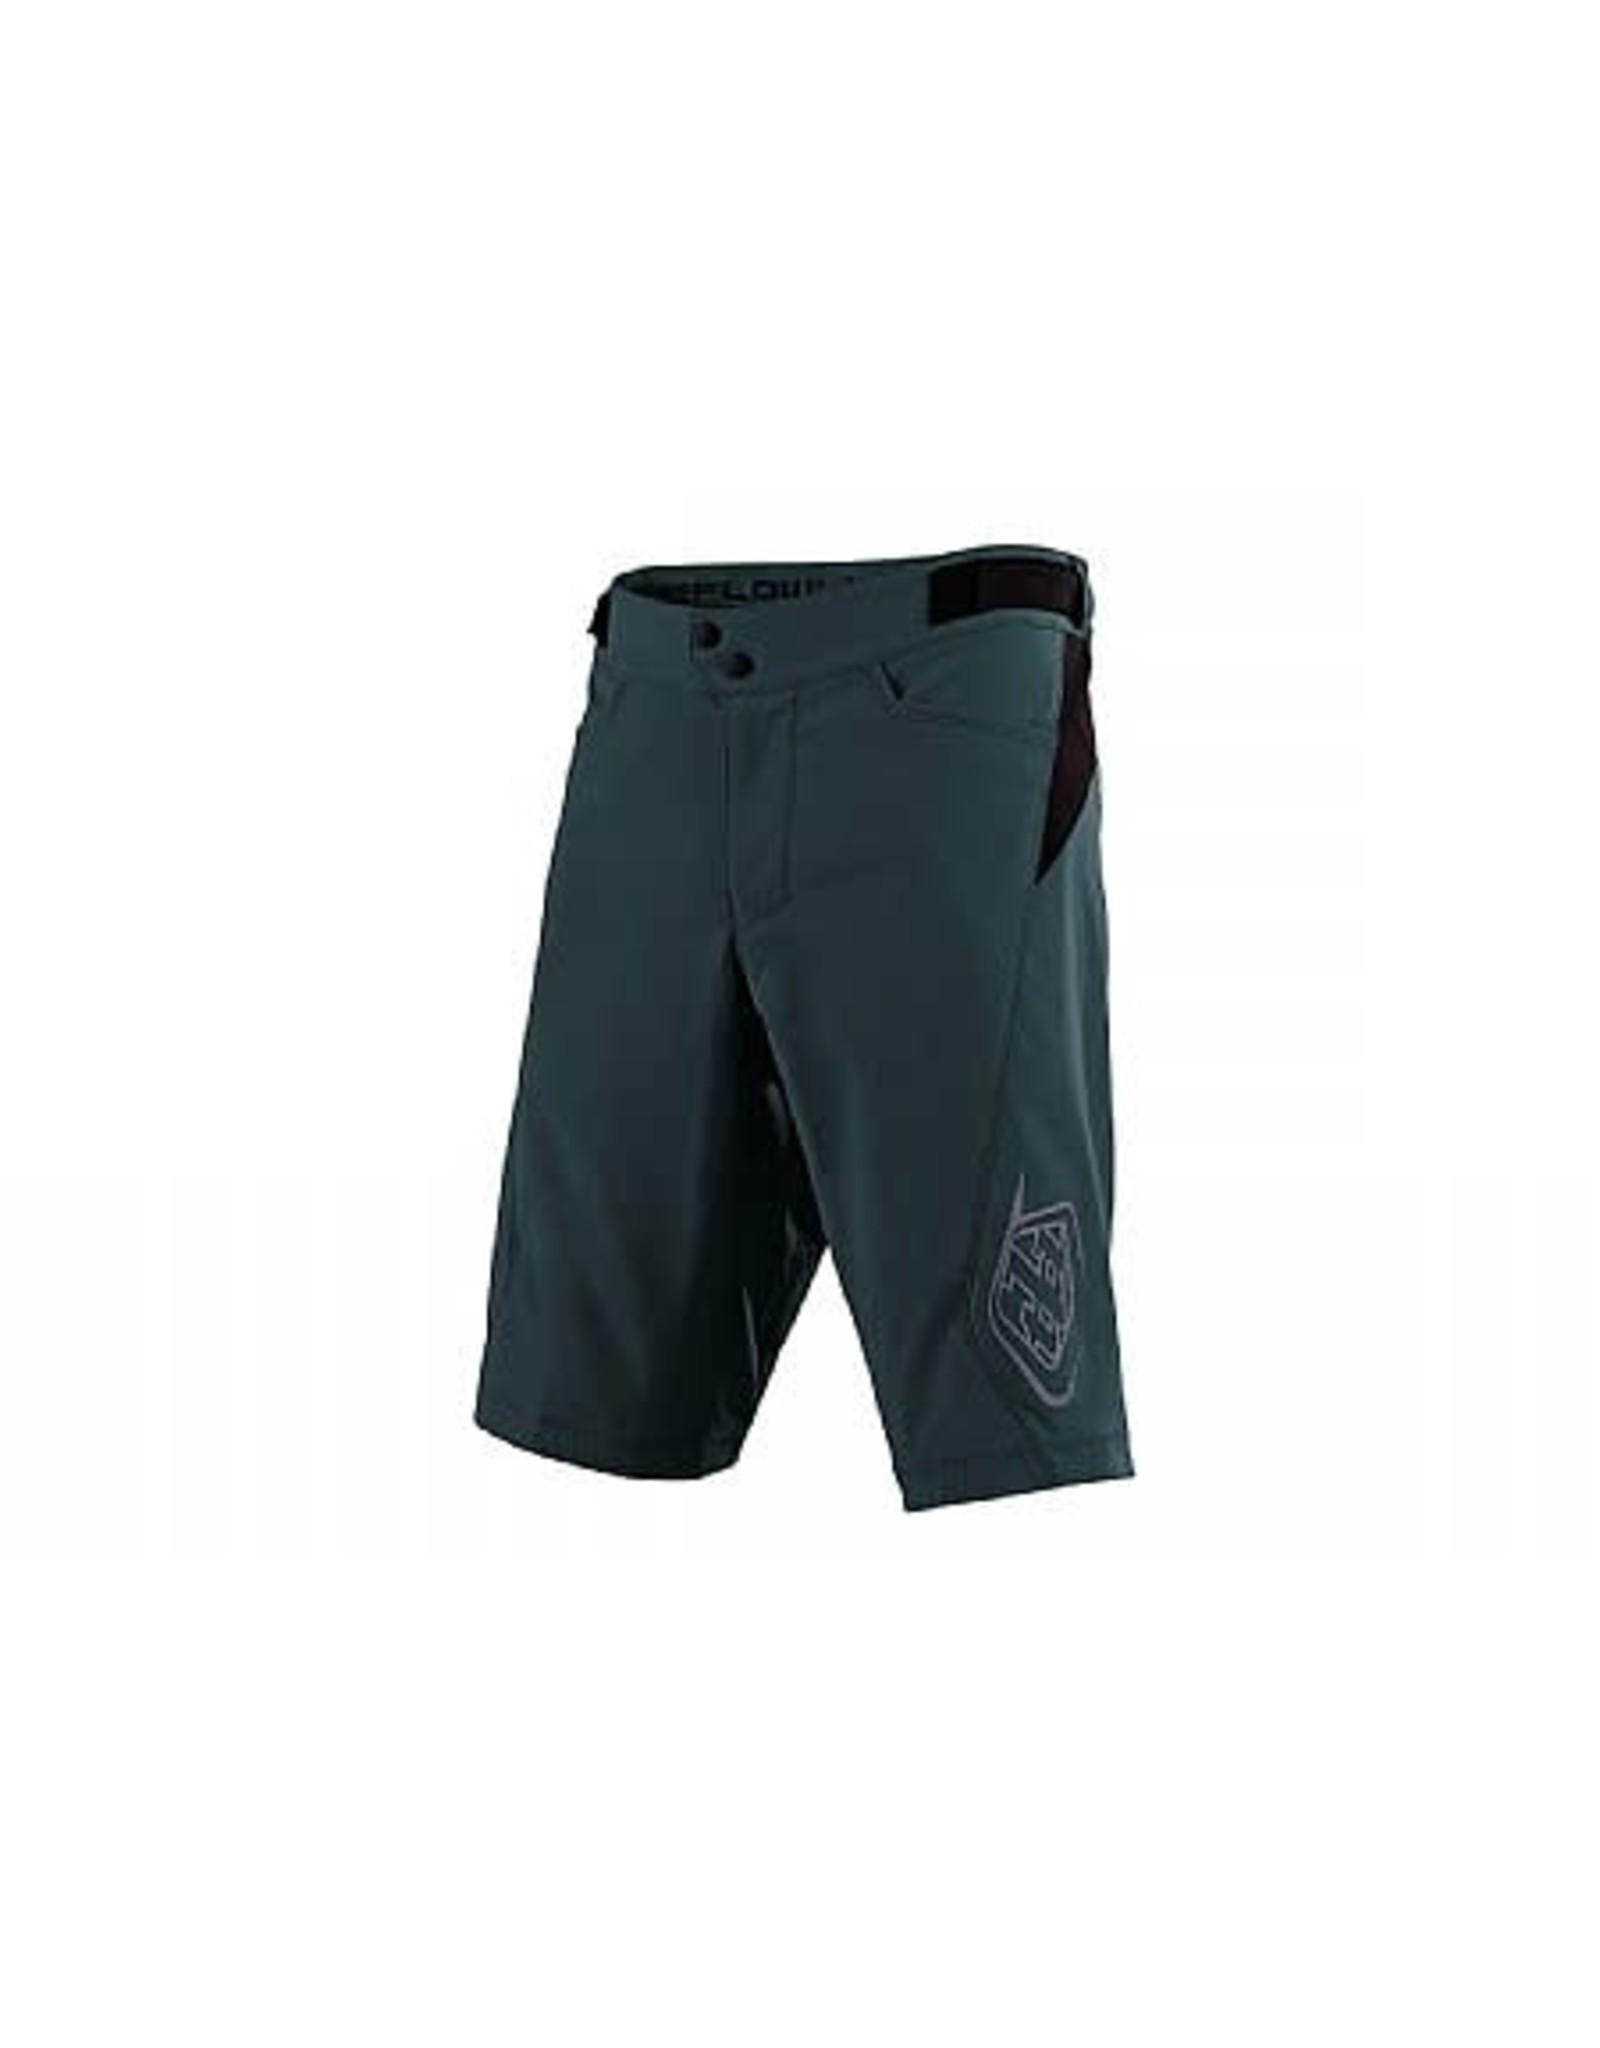 Troy Lee Design Flowline Shorts